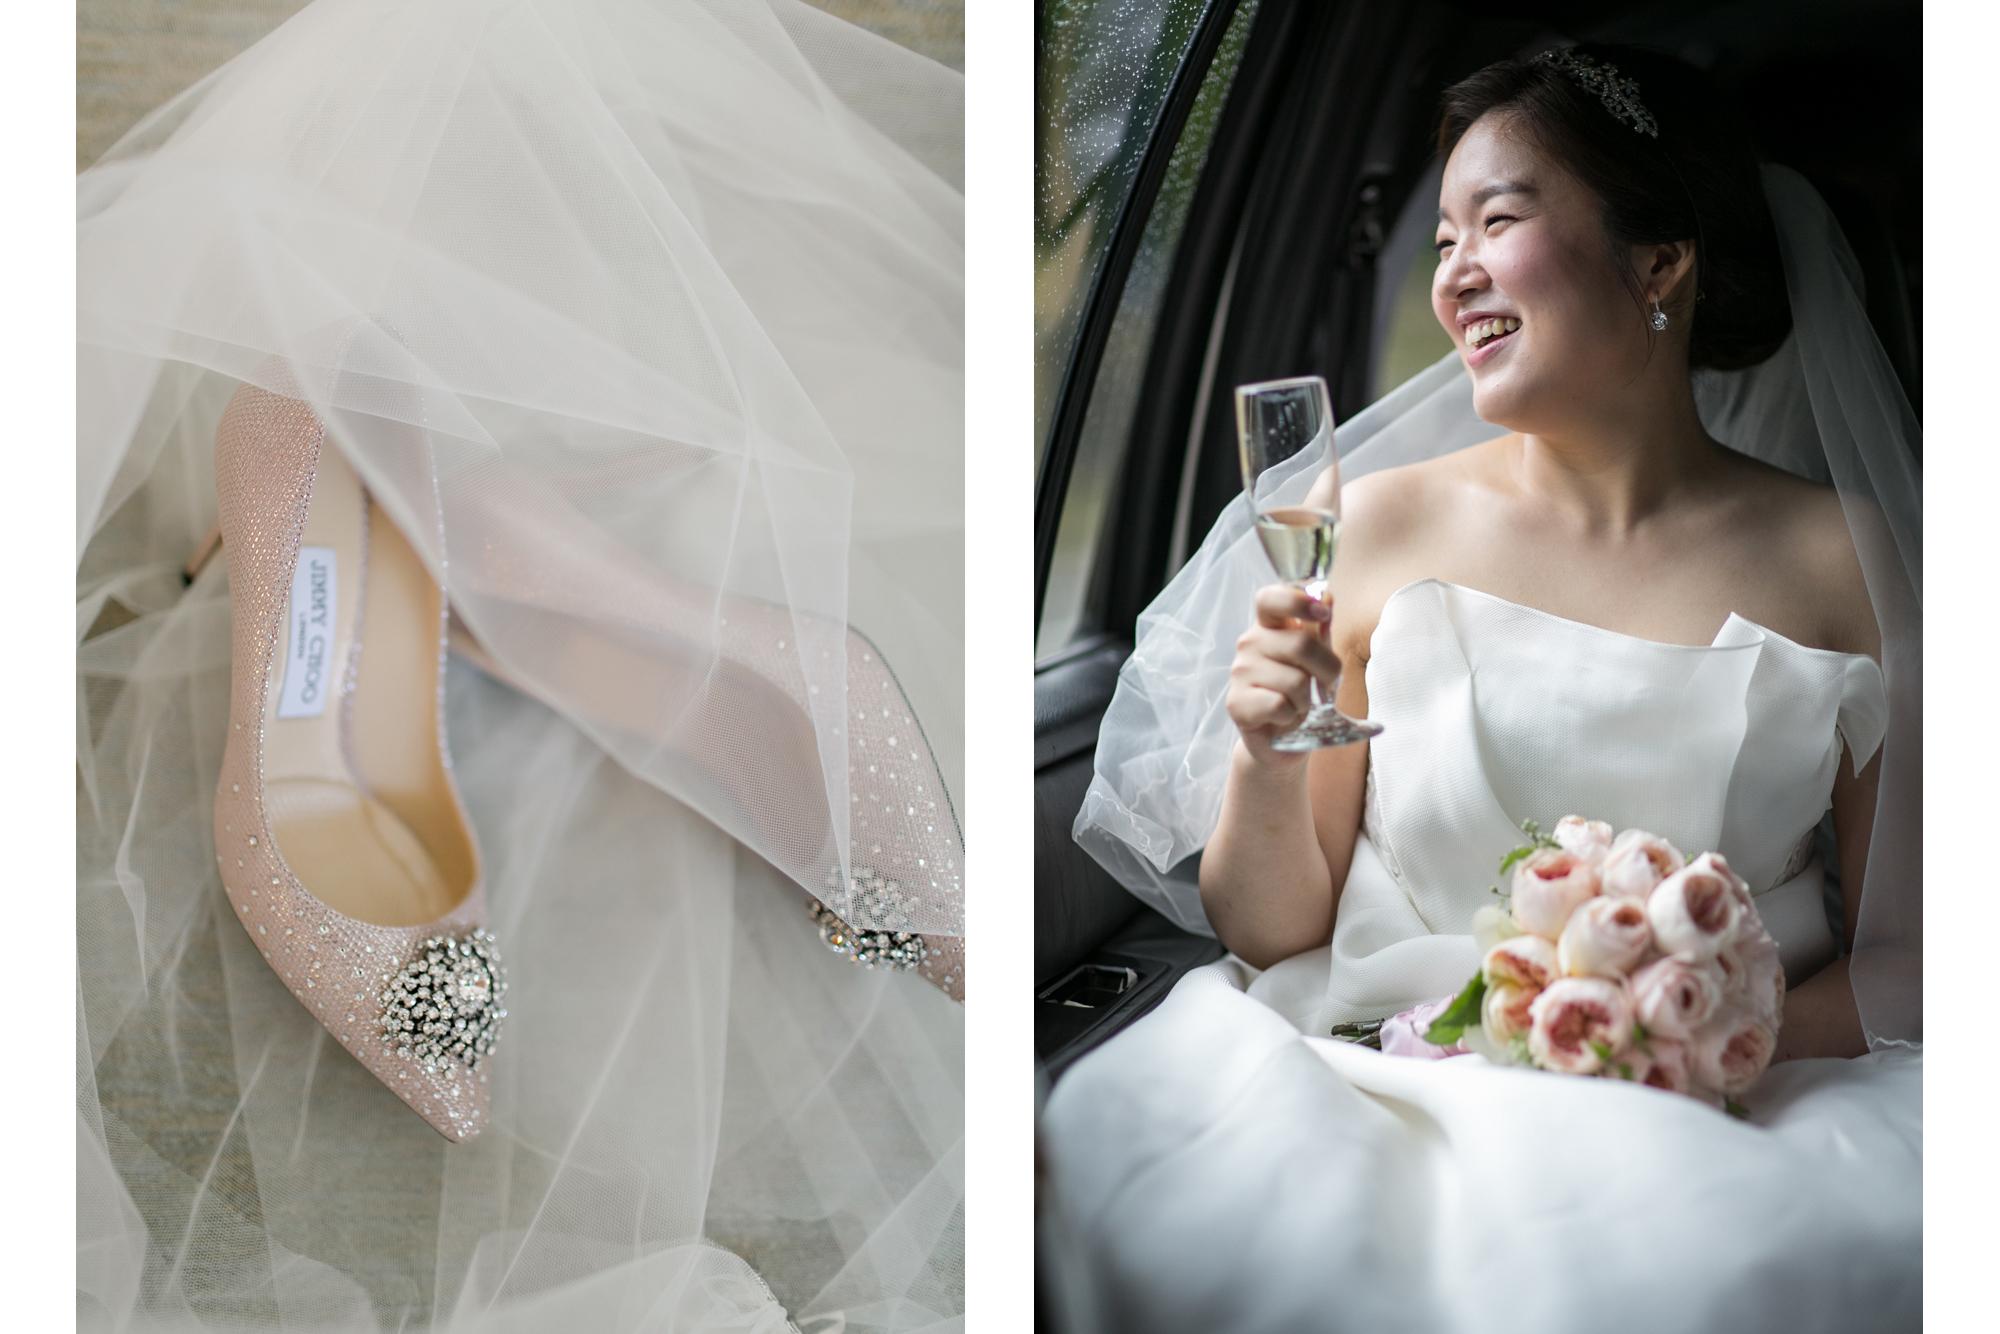 vancouver-luxury-wedding-photographer-lori-miles-26.jpg